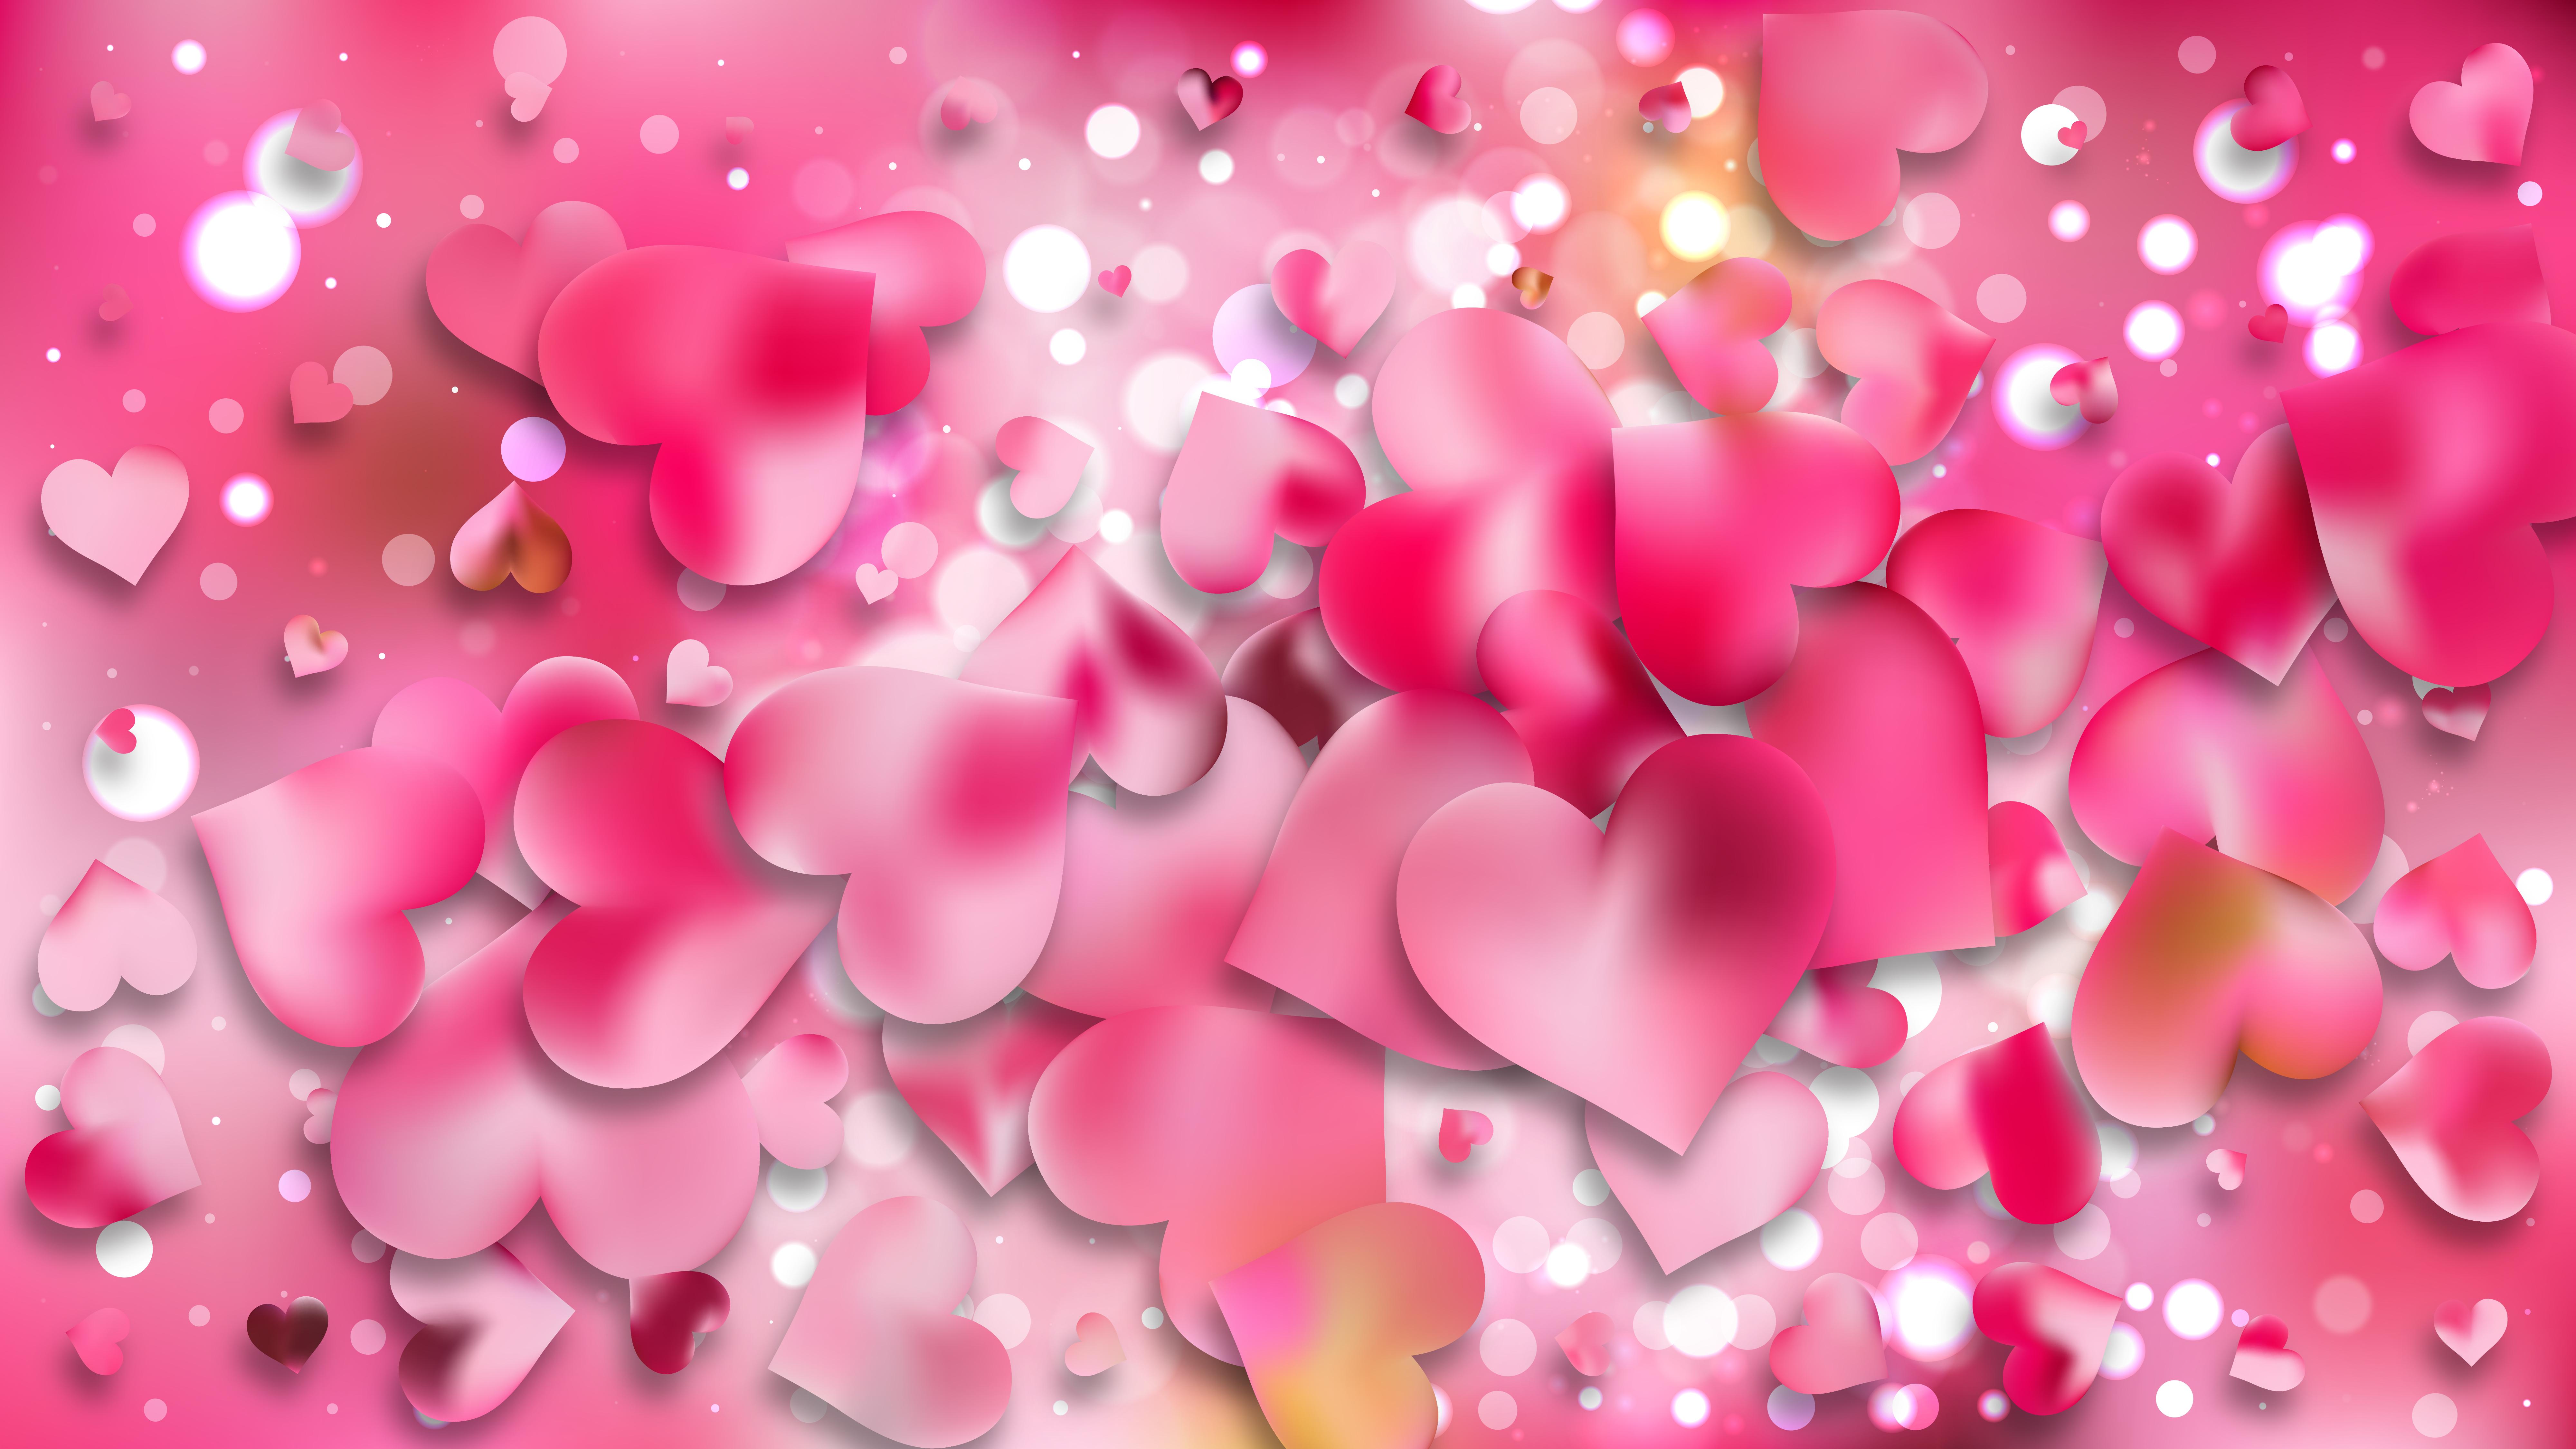 Pink Heart Wallpaper Background Vector Image